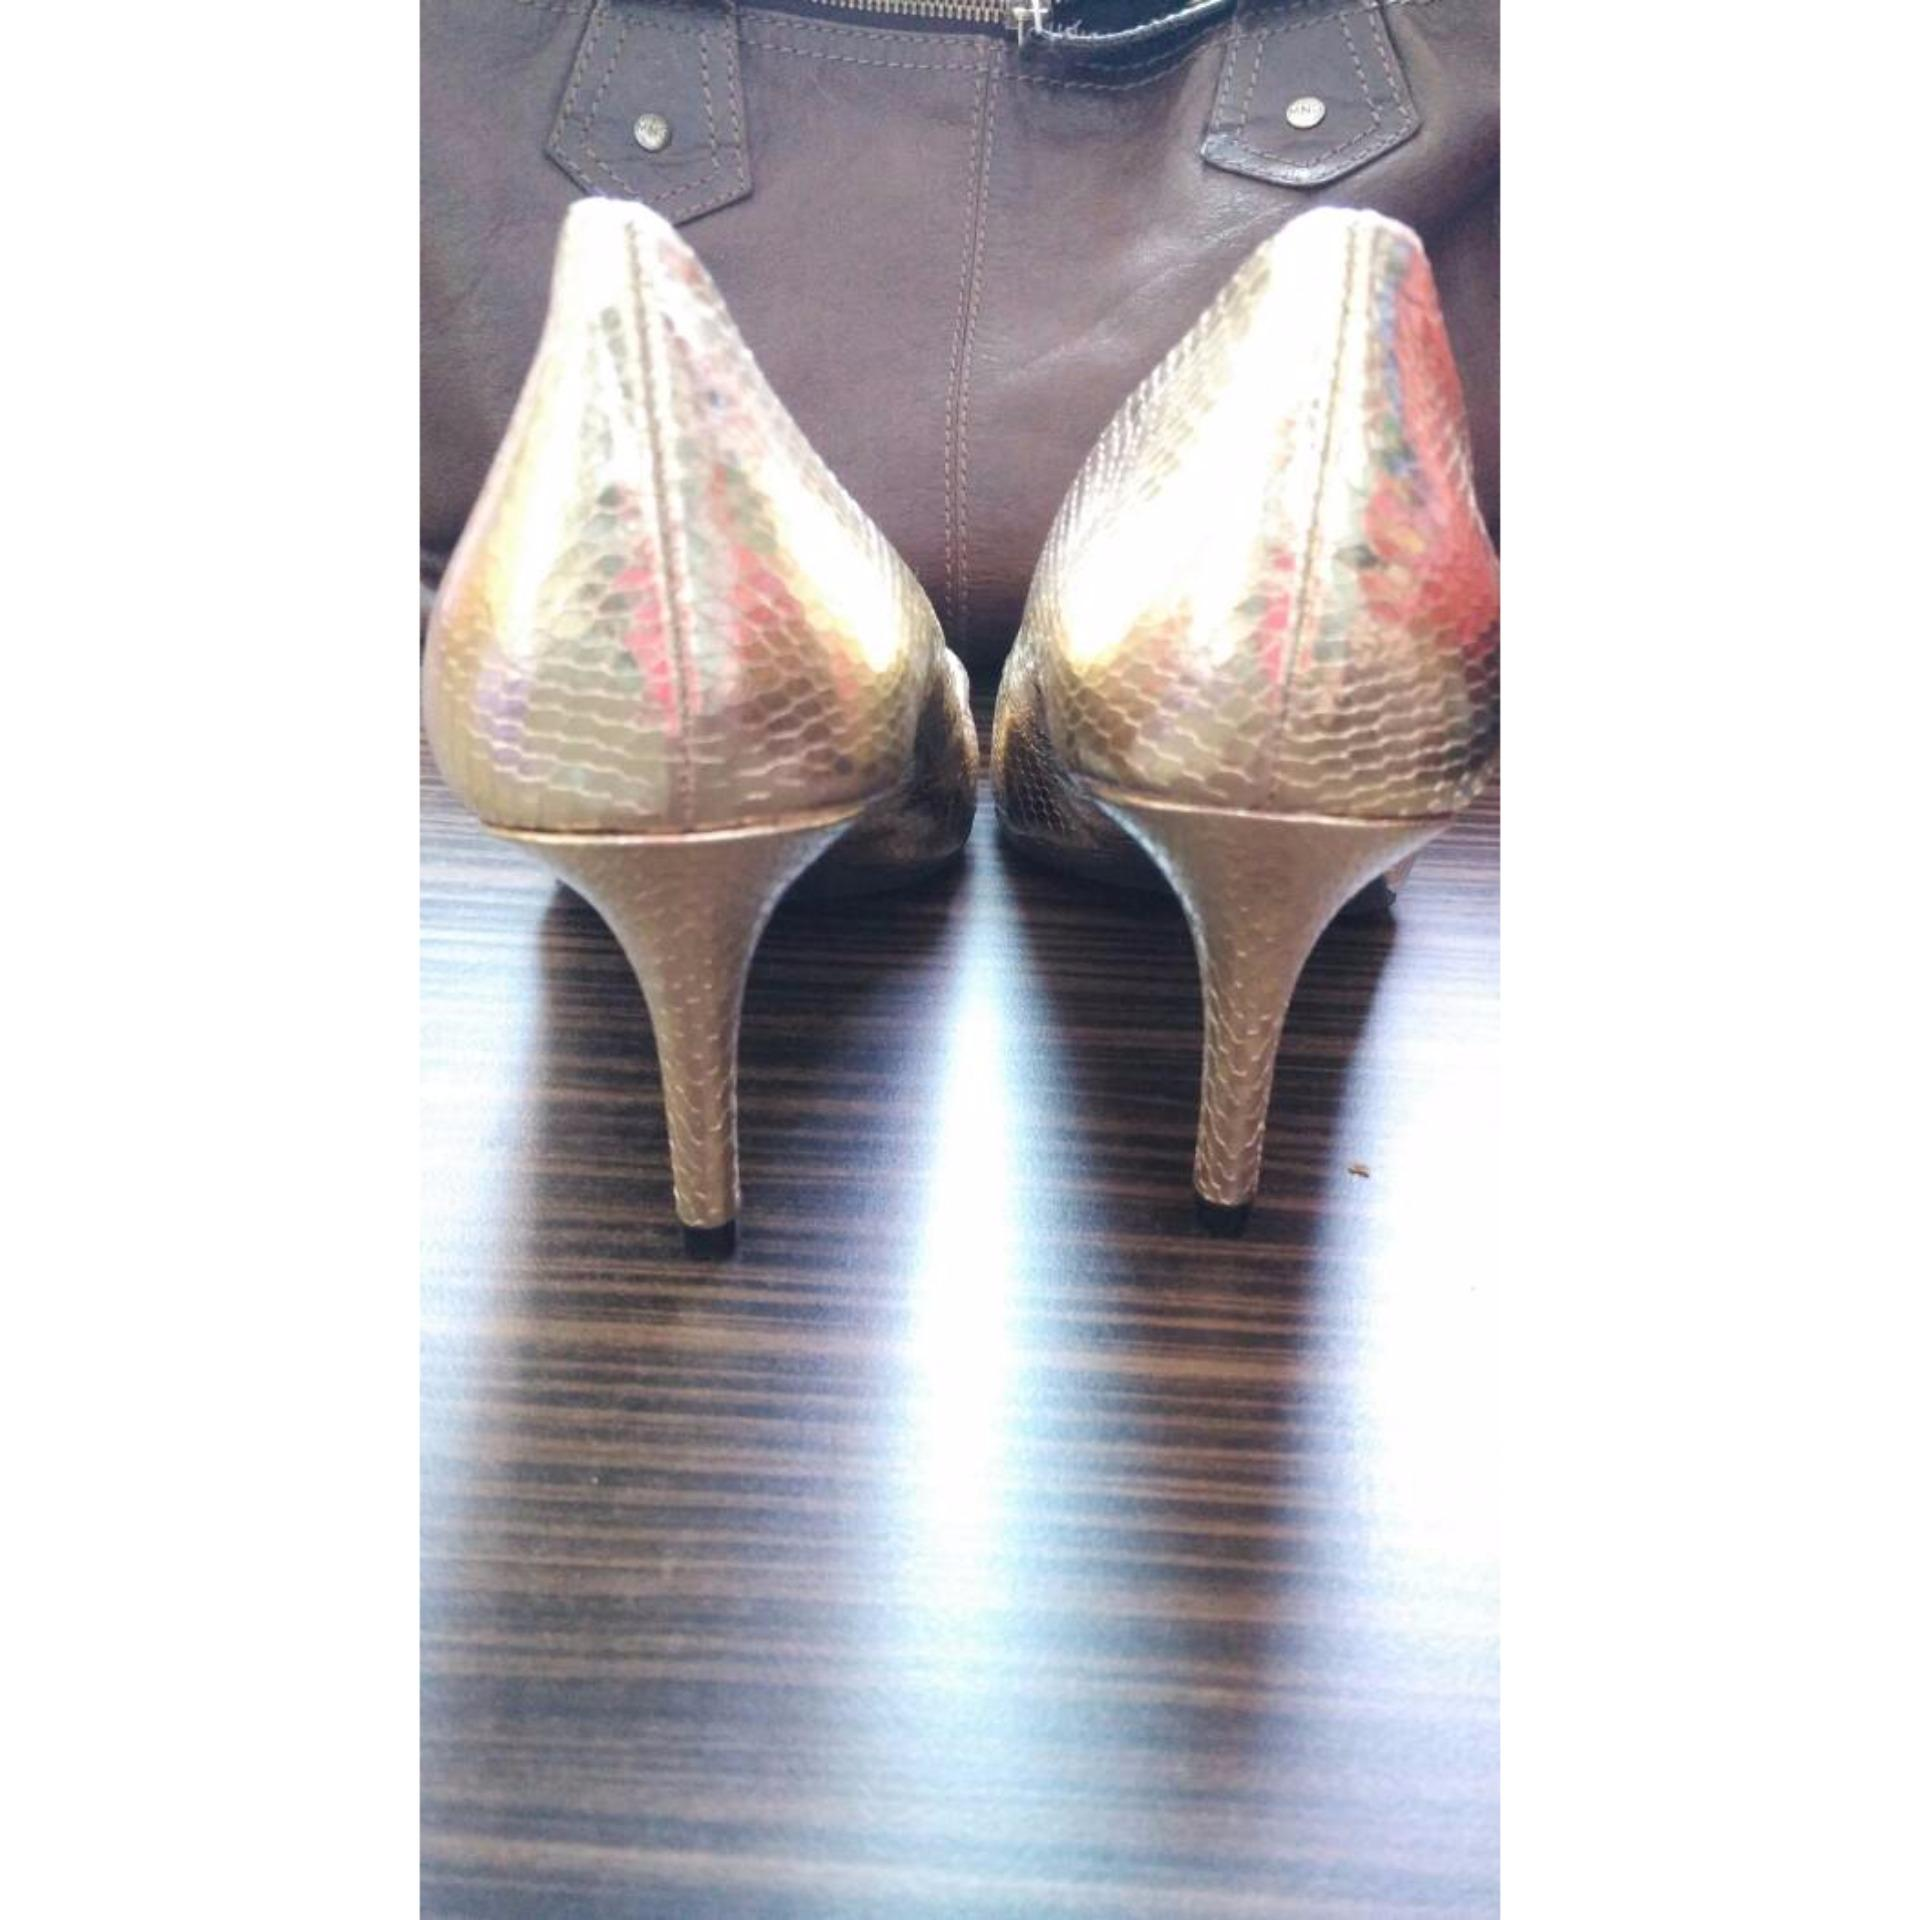 High Heels Sepatu Wanita Hitam S167 Daftar Harga Terbaru D Tb41 Payless Shoes Pesta Gold Branded Ori